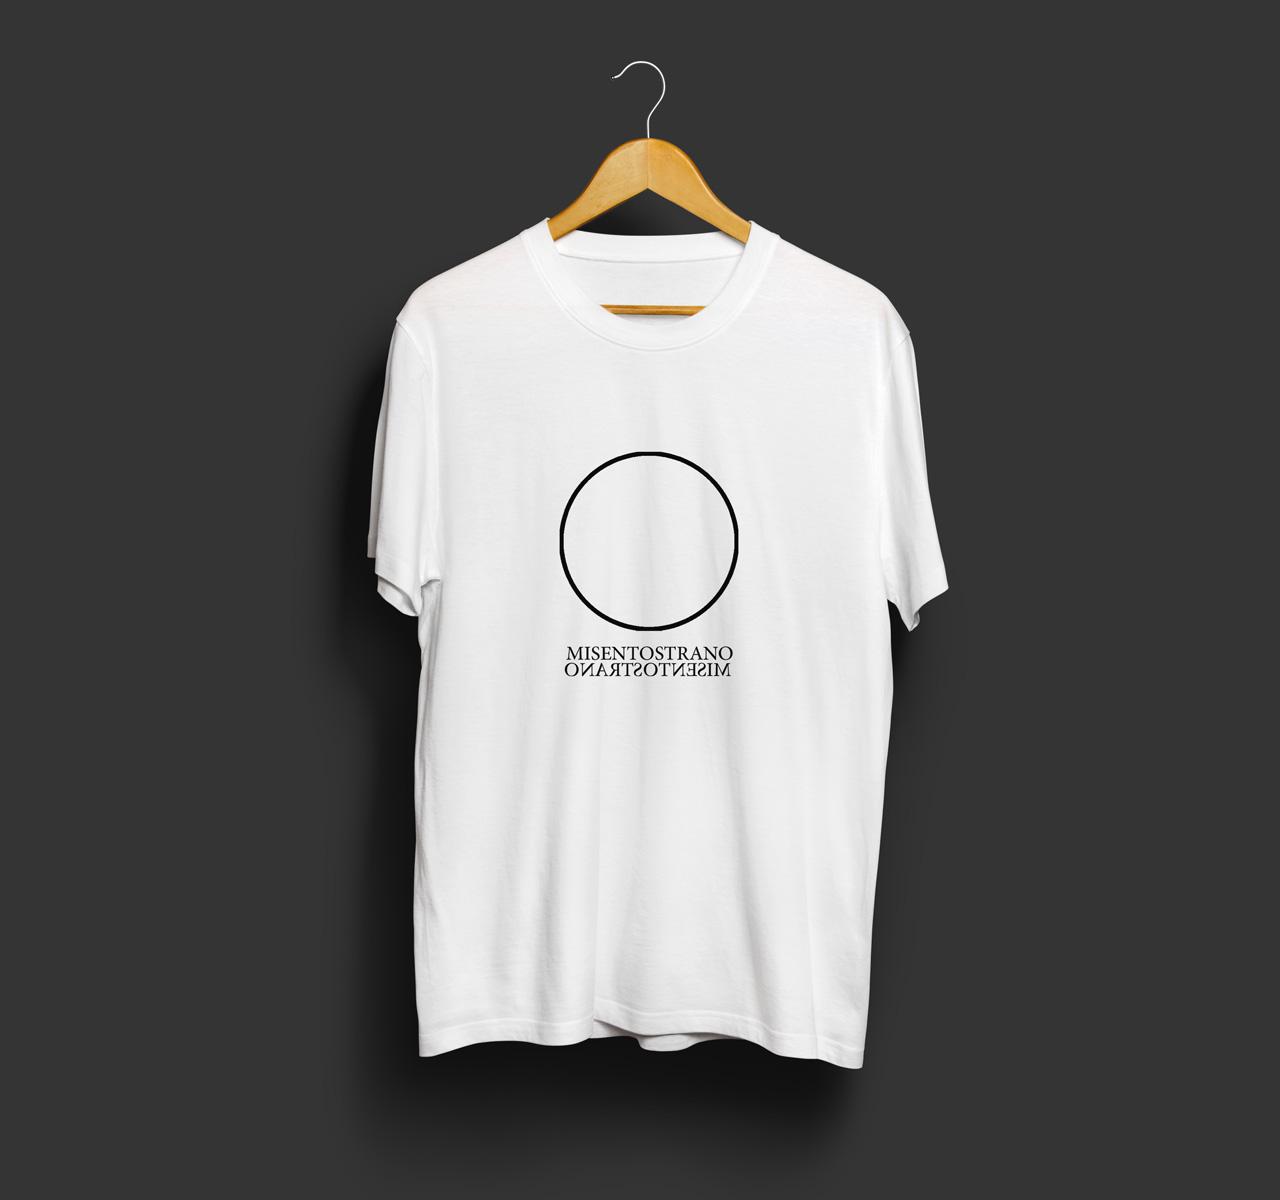 Misentostrano Tshirt - EXRCM